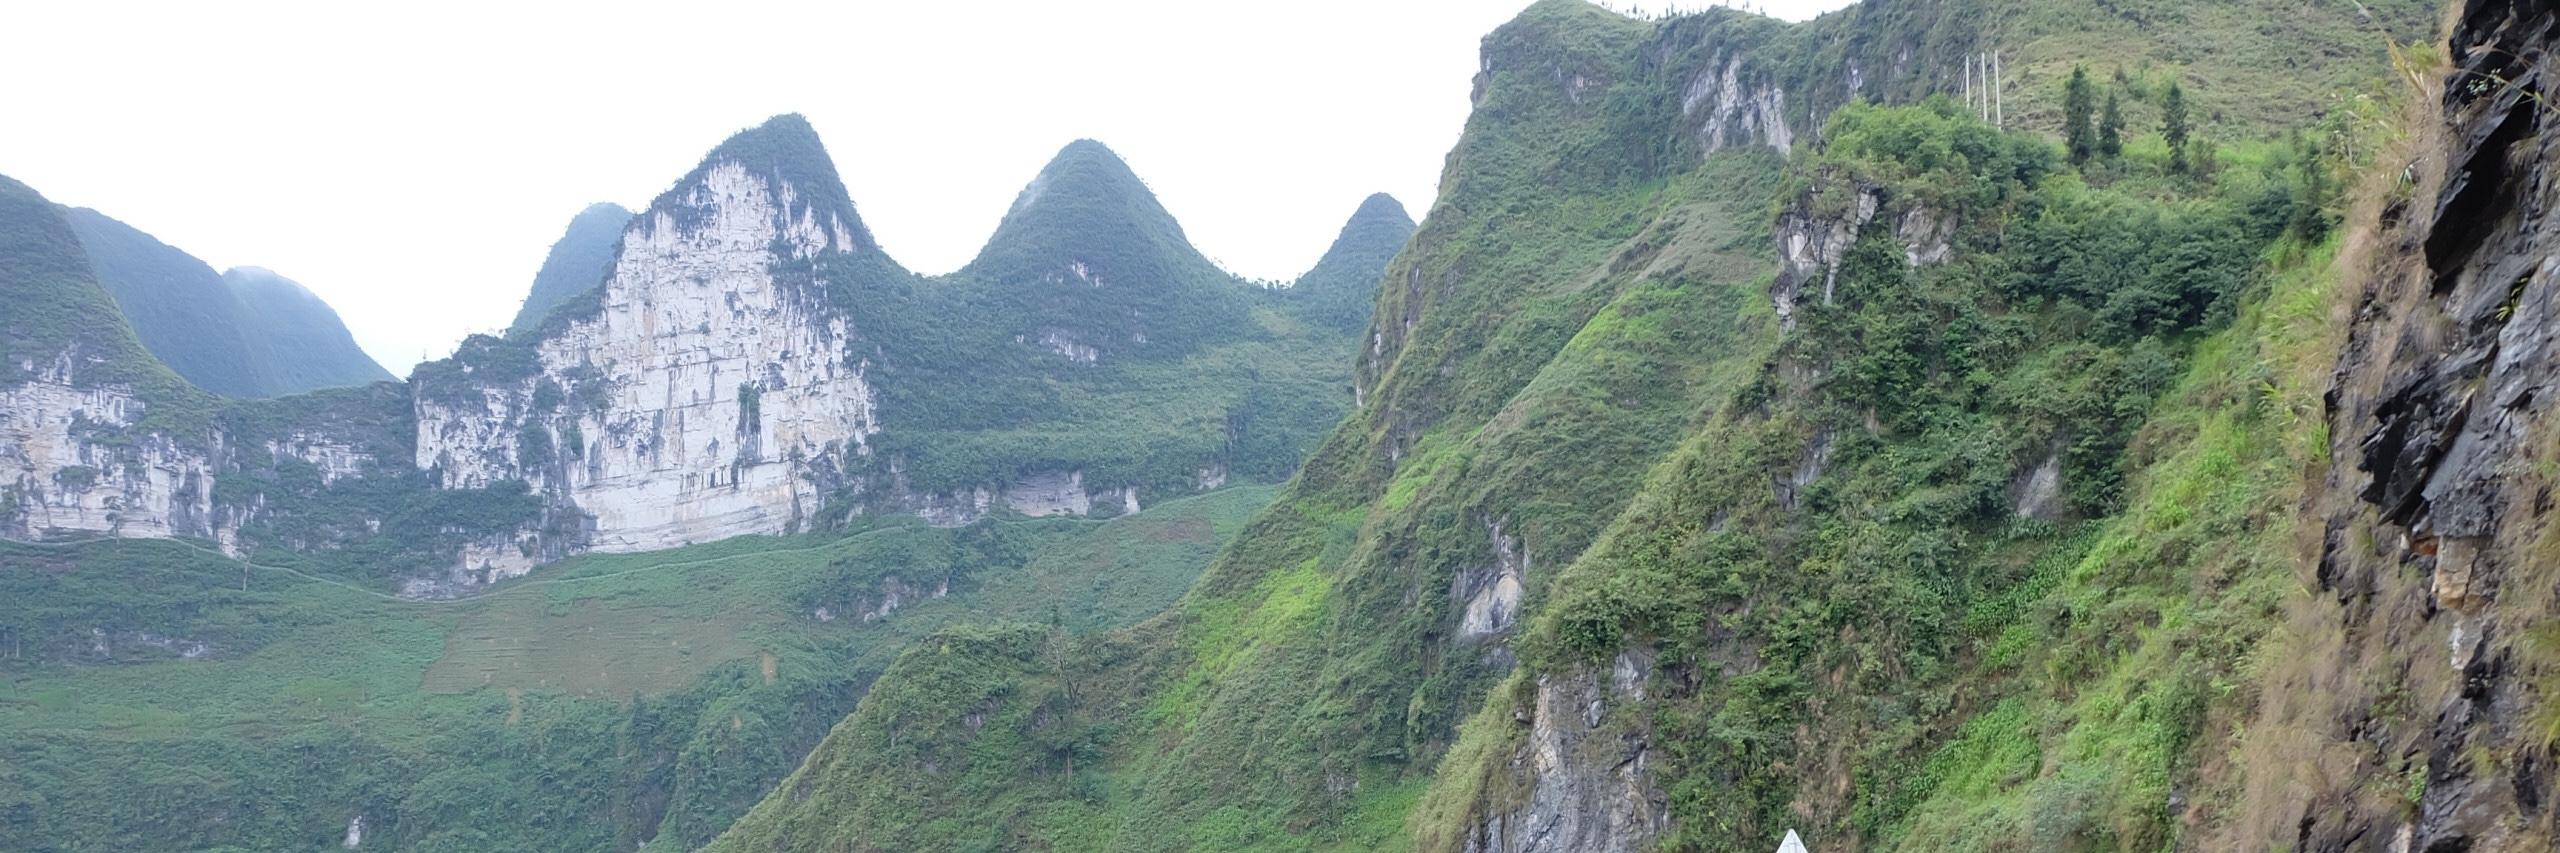 https://gody.vn/blog/22588861176824789496/post/ha-giang-manh-dat-khong-the-khong-quay-lai-2683